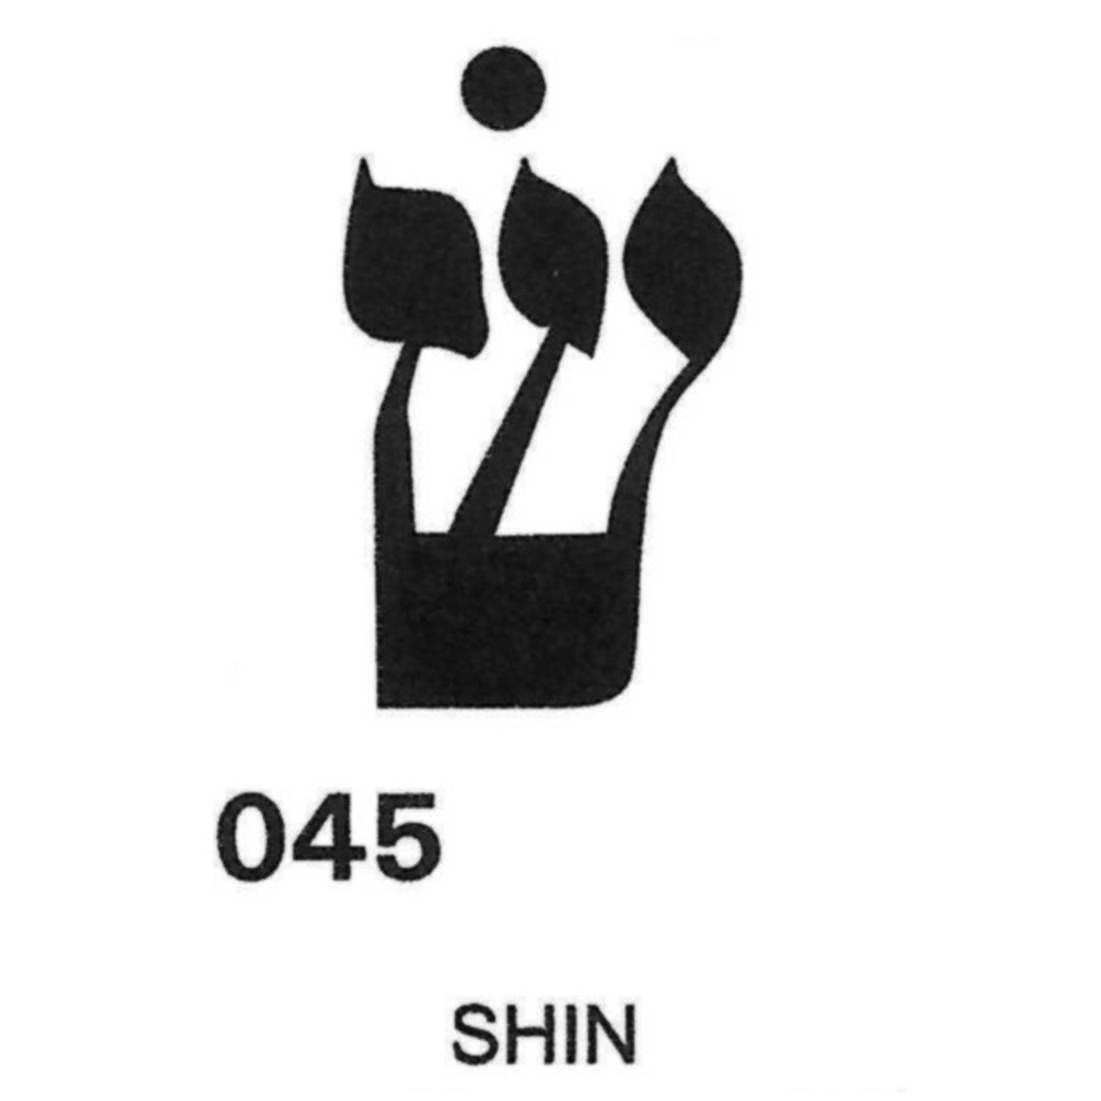 Shin em PVC  - Zots